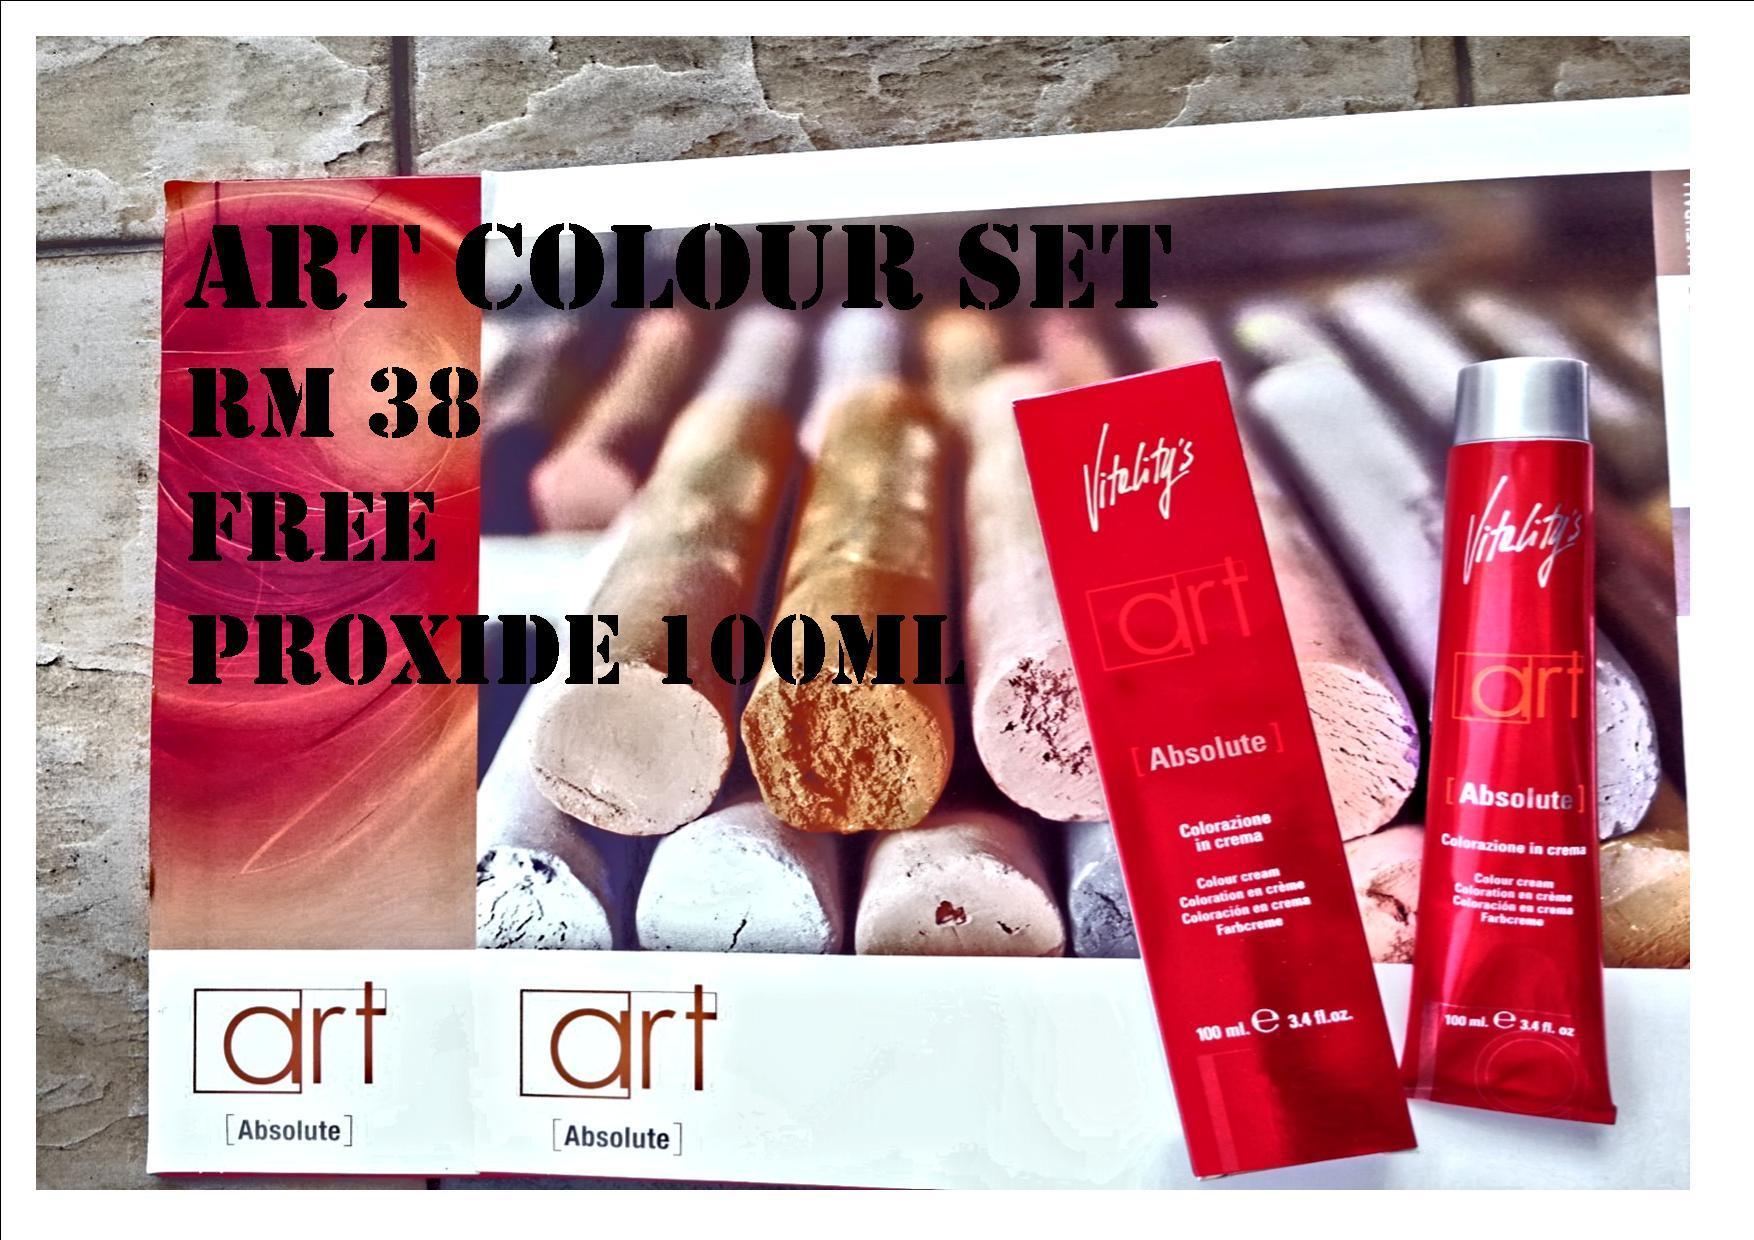 Vitality's Absolute Art Colour Cream 100ML Art Colour Set